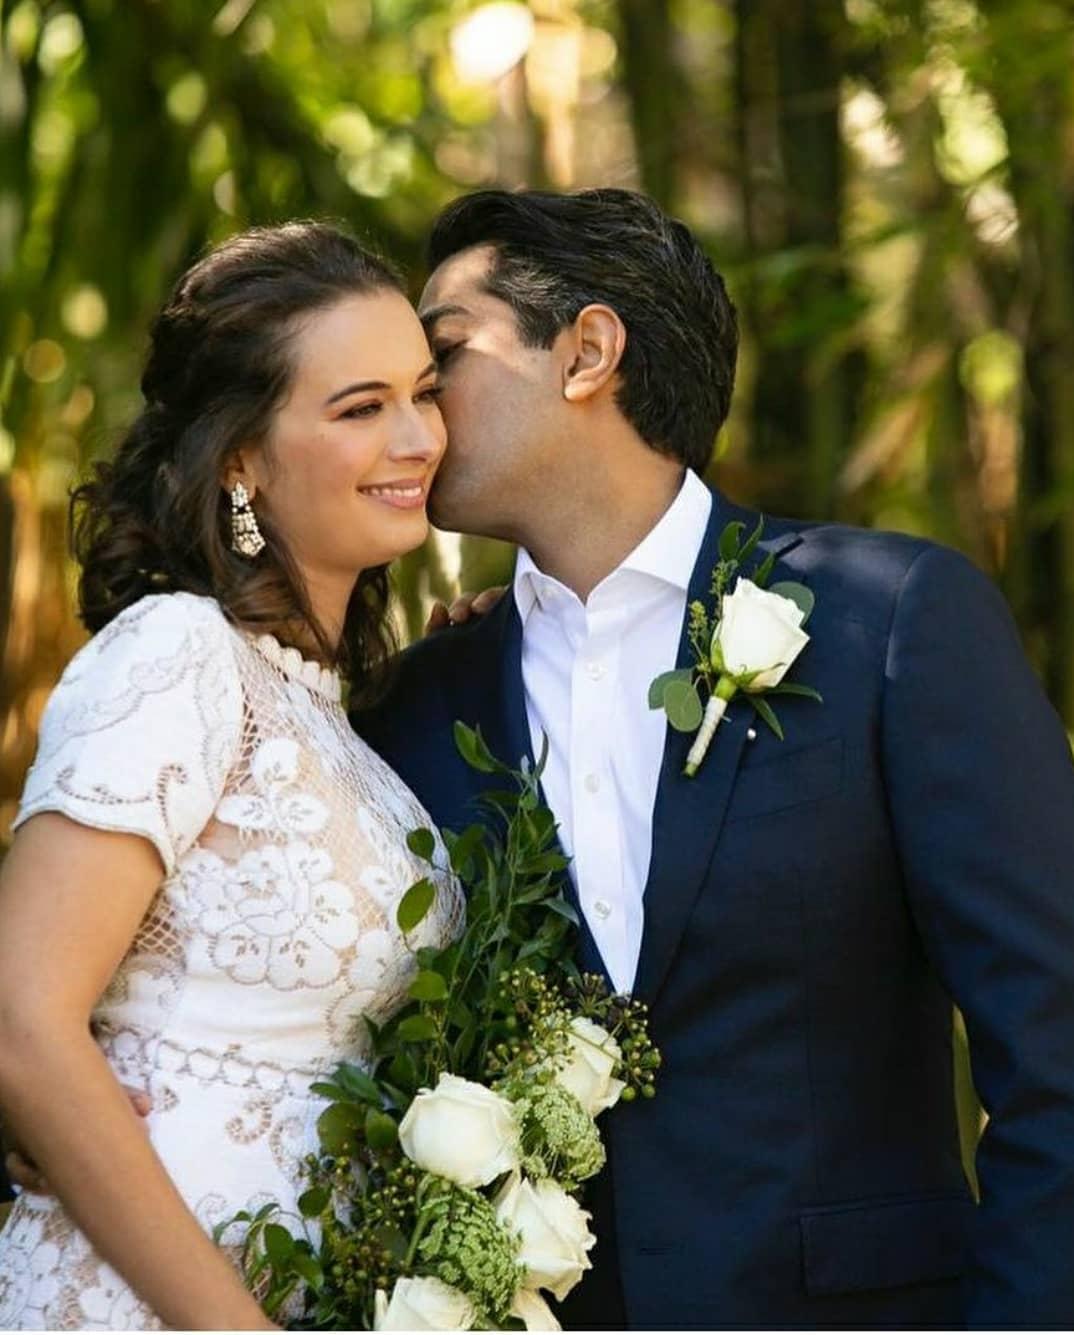 evelyn sharma's intimate wedding